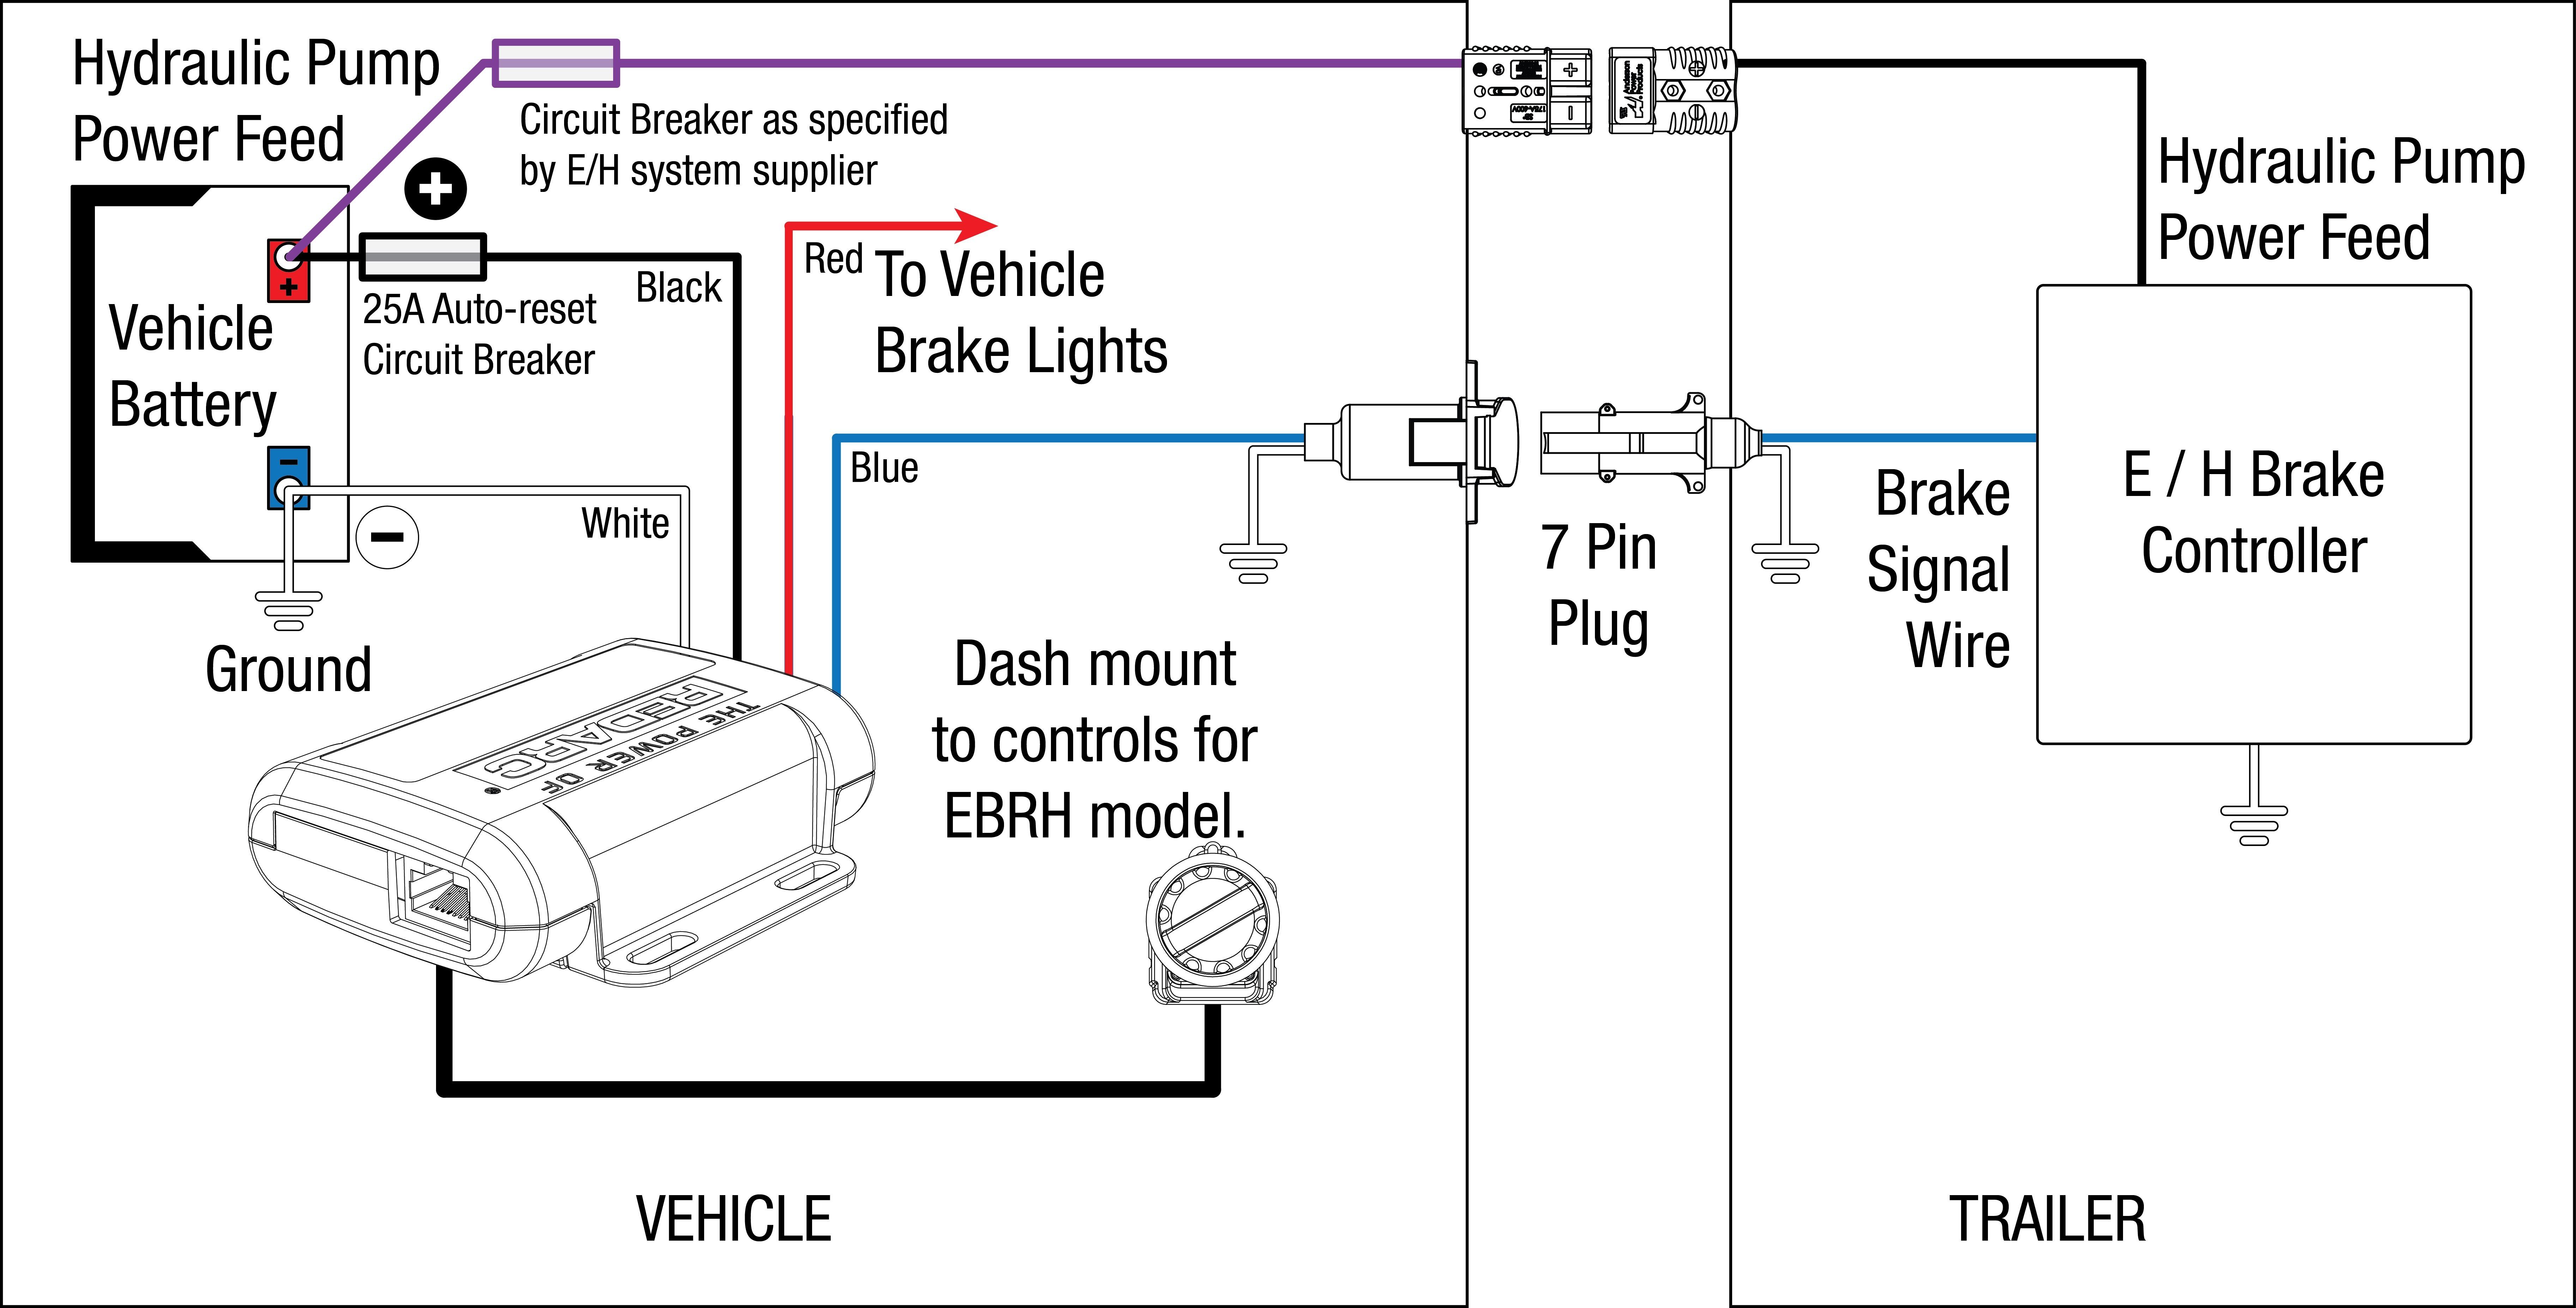 Trailer Breakaway Wiring Diagram Trailer Breakaway Switch Wiring Diagram Lovely Electric Trailer Of Trailer Breakaway Wiring Diagram